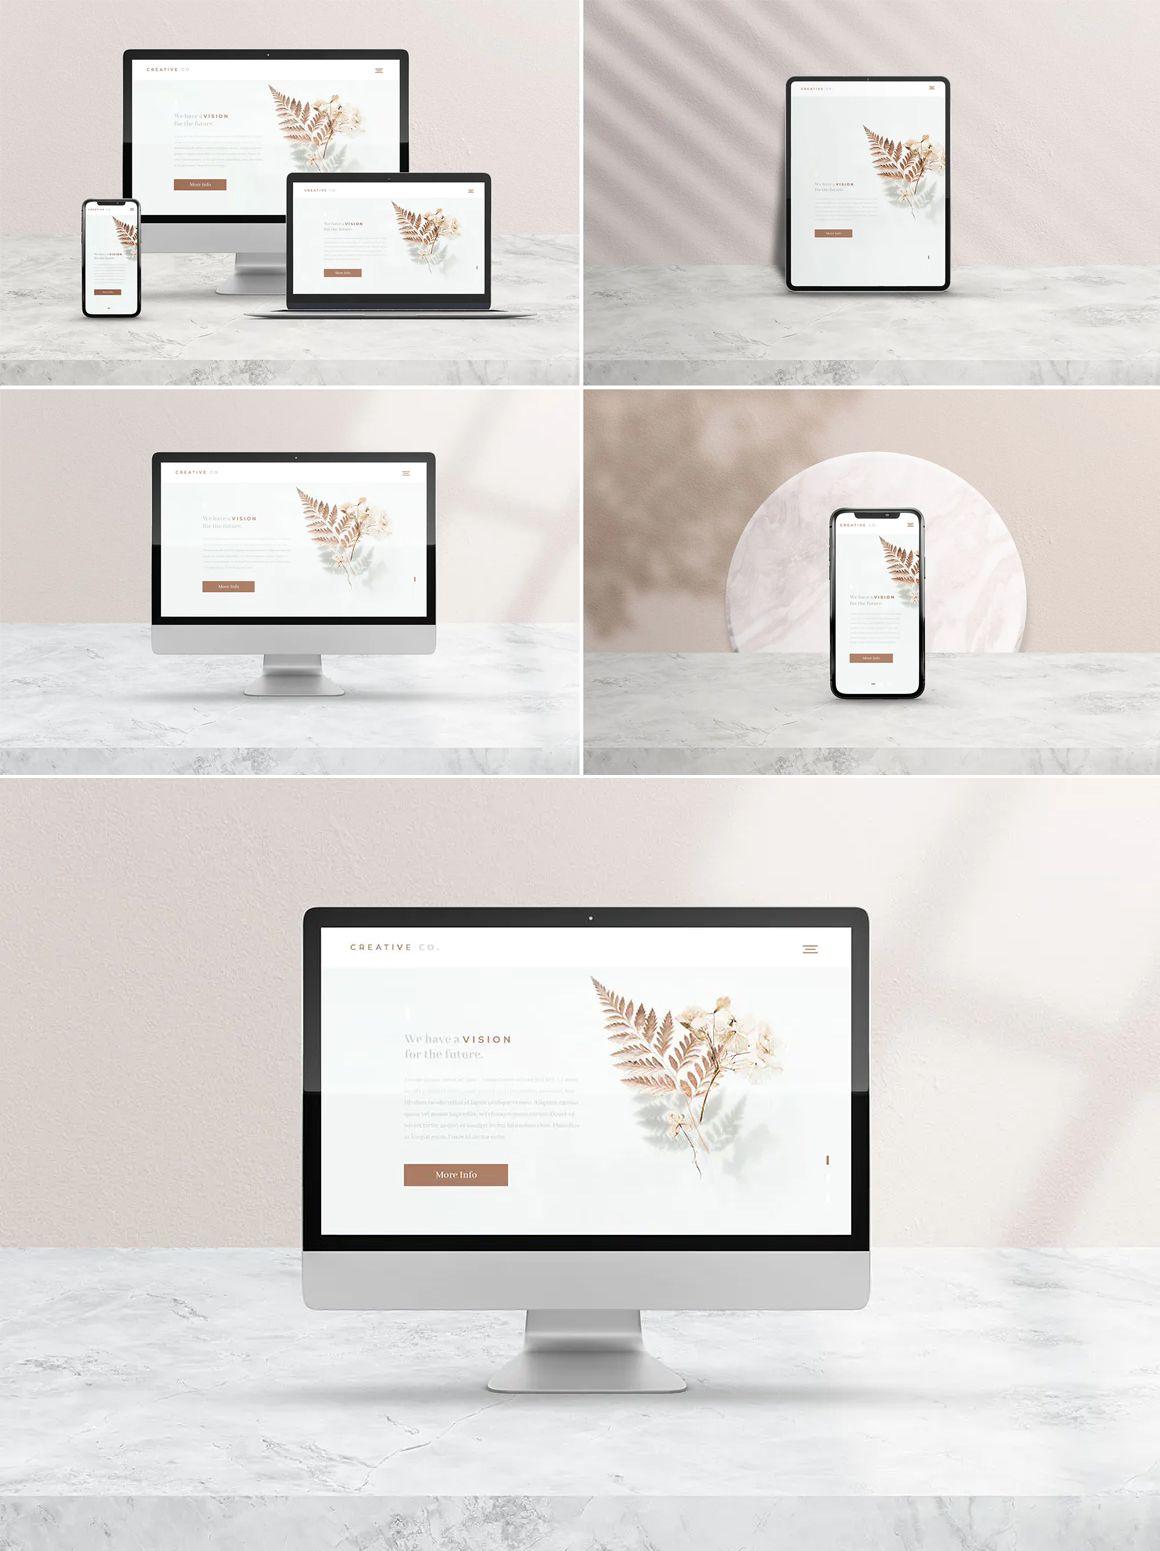 Create free mockup online